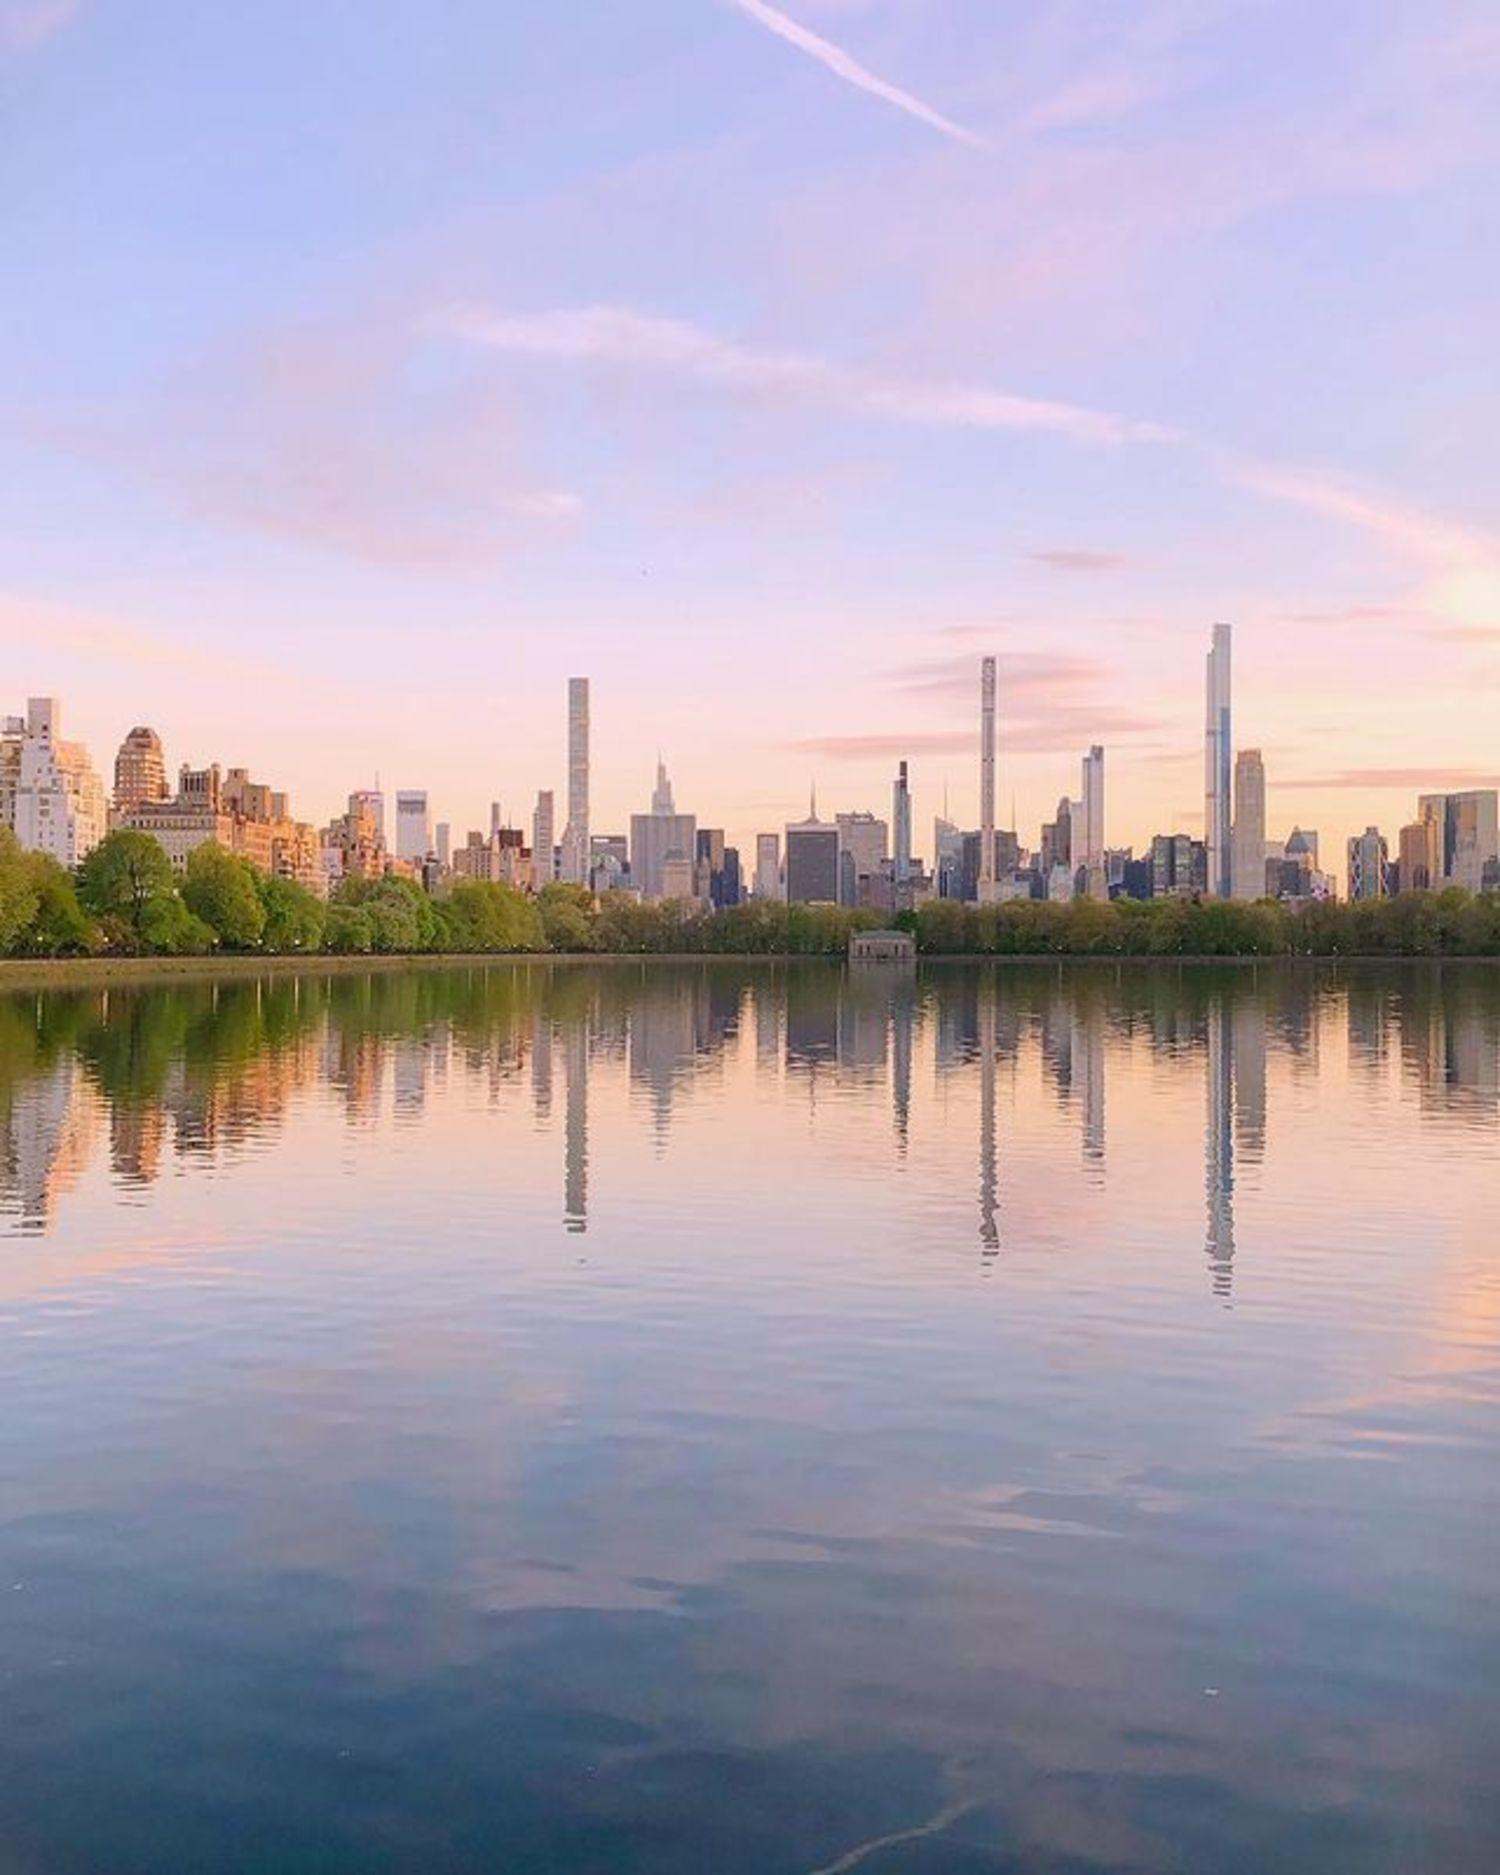 Jacqueline Kennedy Onassis Reservoir, Central Park, Manhattan